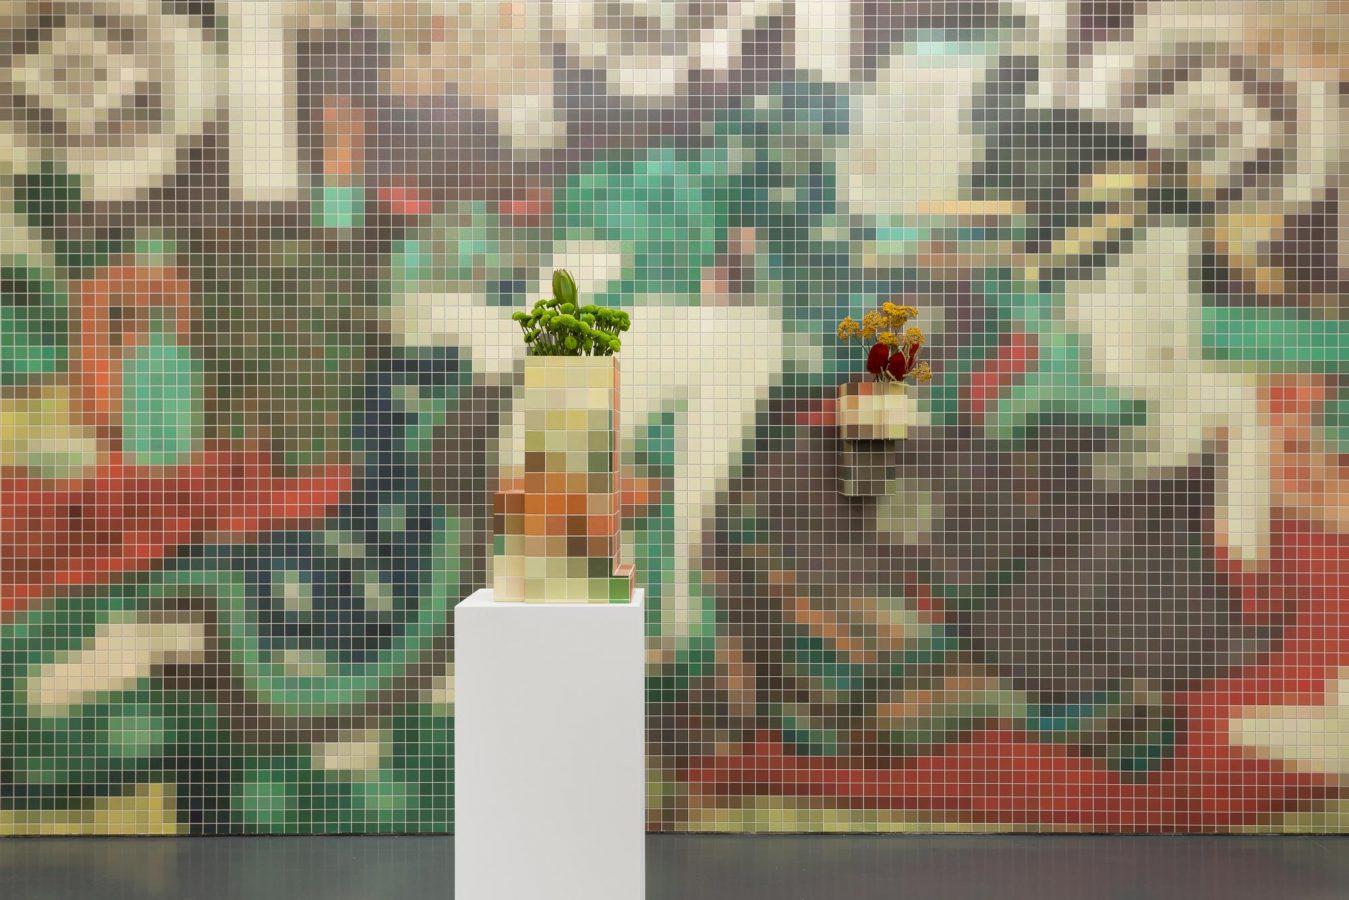 Galeria Pedro Cera – Tobias Rehberger - On Shunga